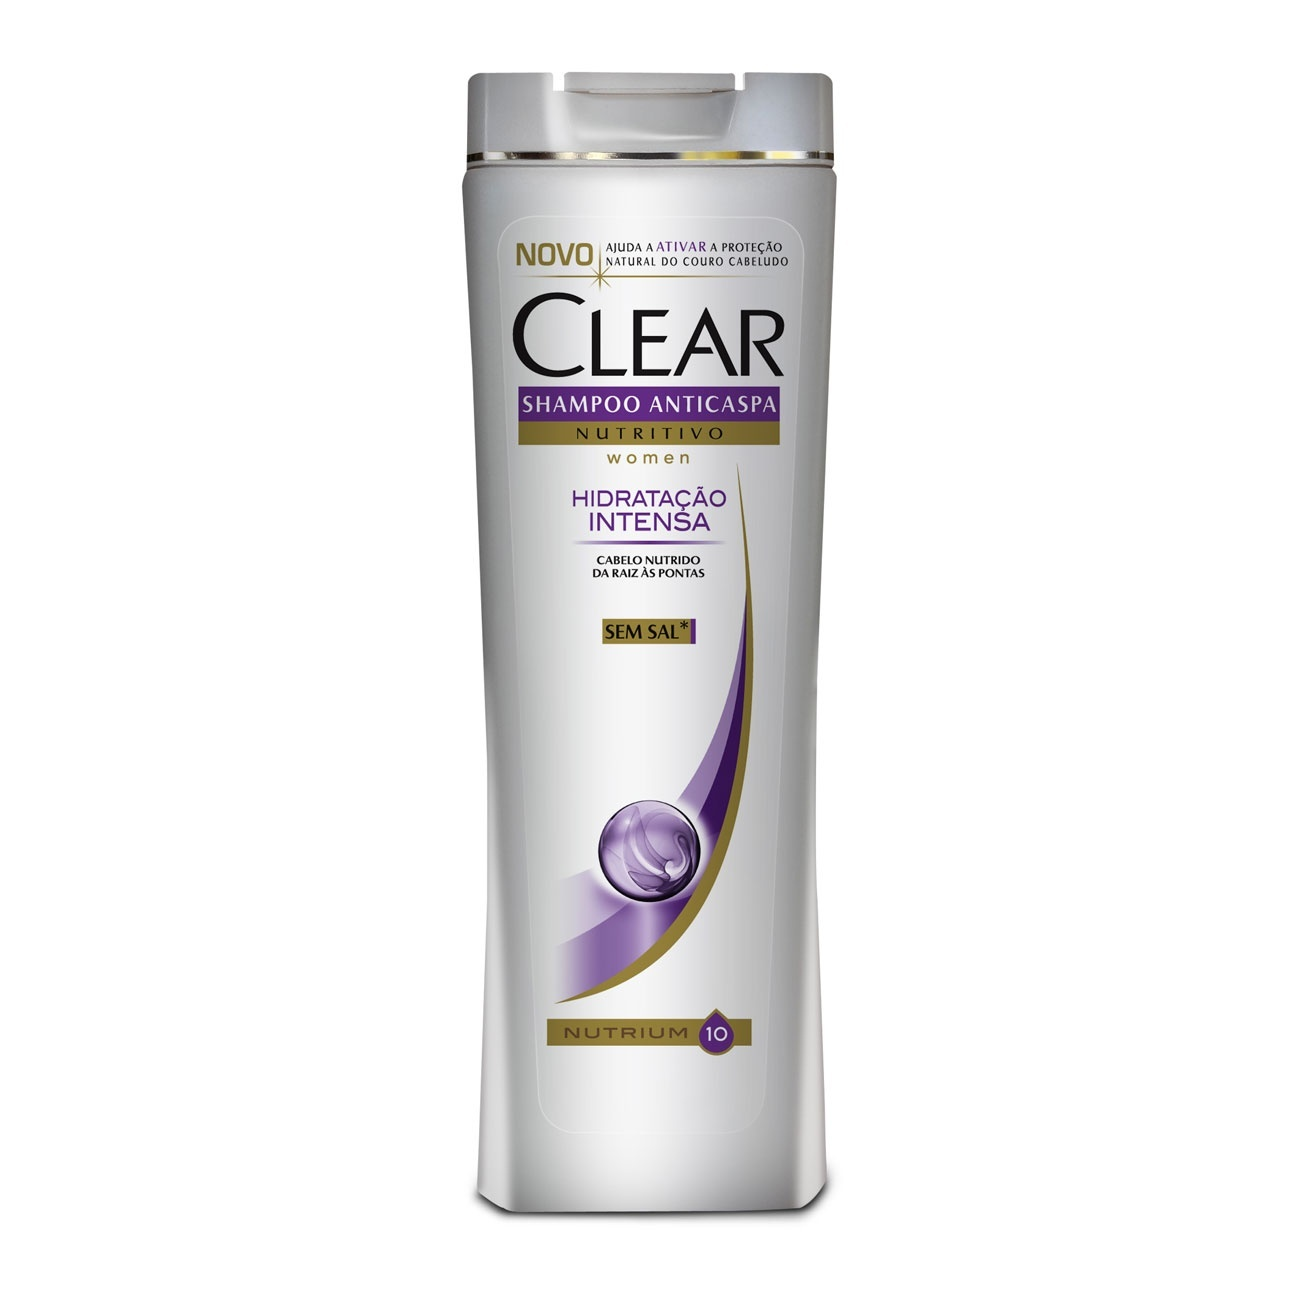 Shampoo Anticaspa Clear Women Hidrata��o Intensa 200Ml